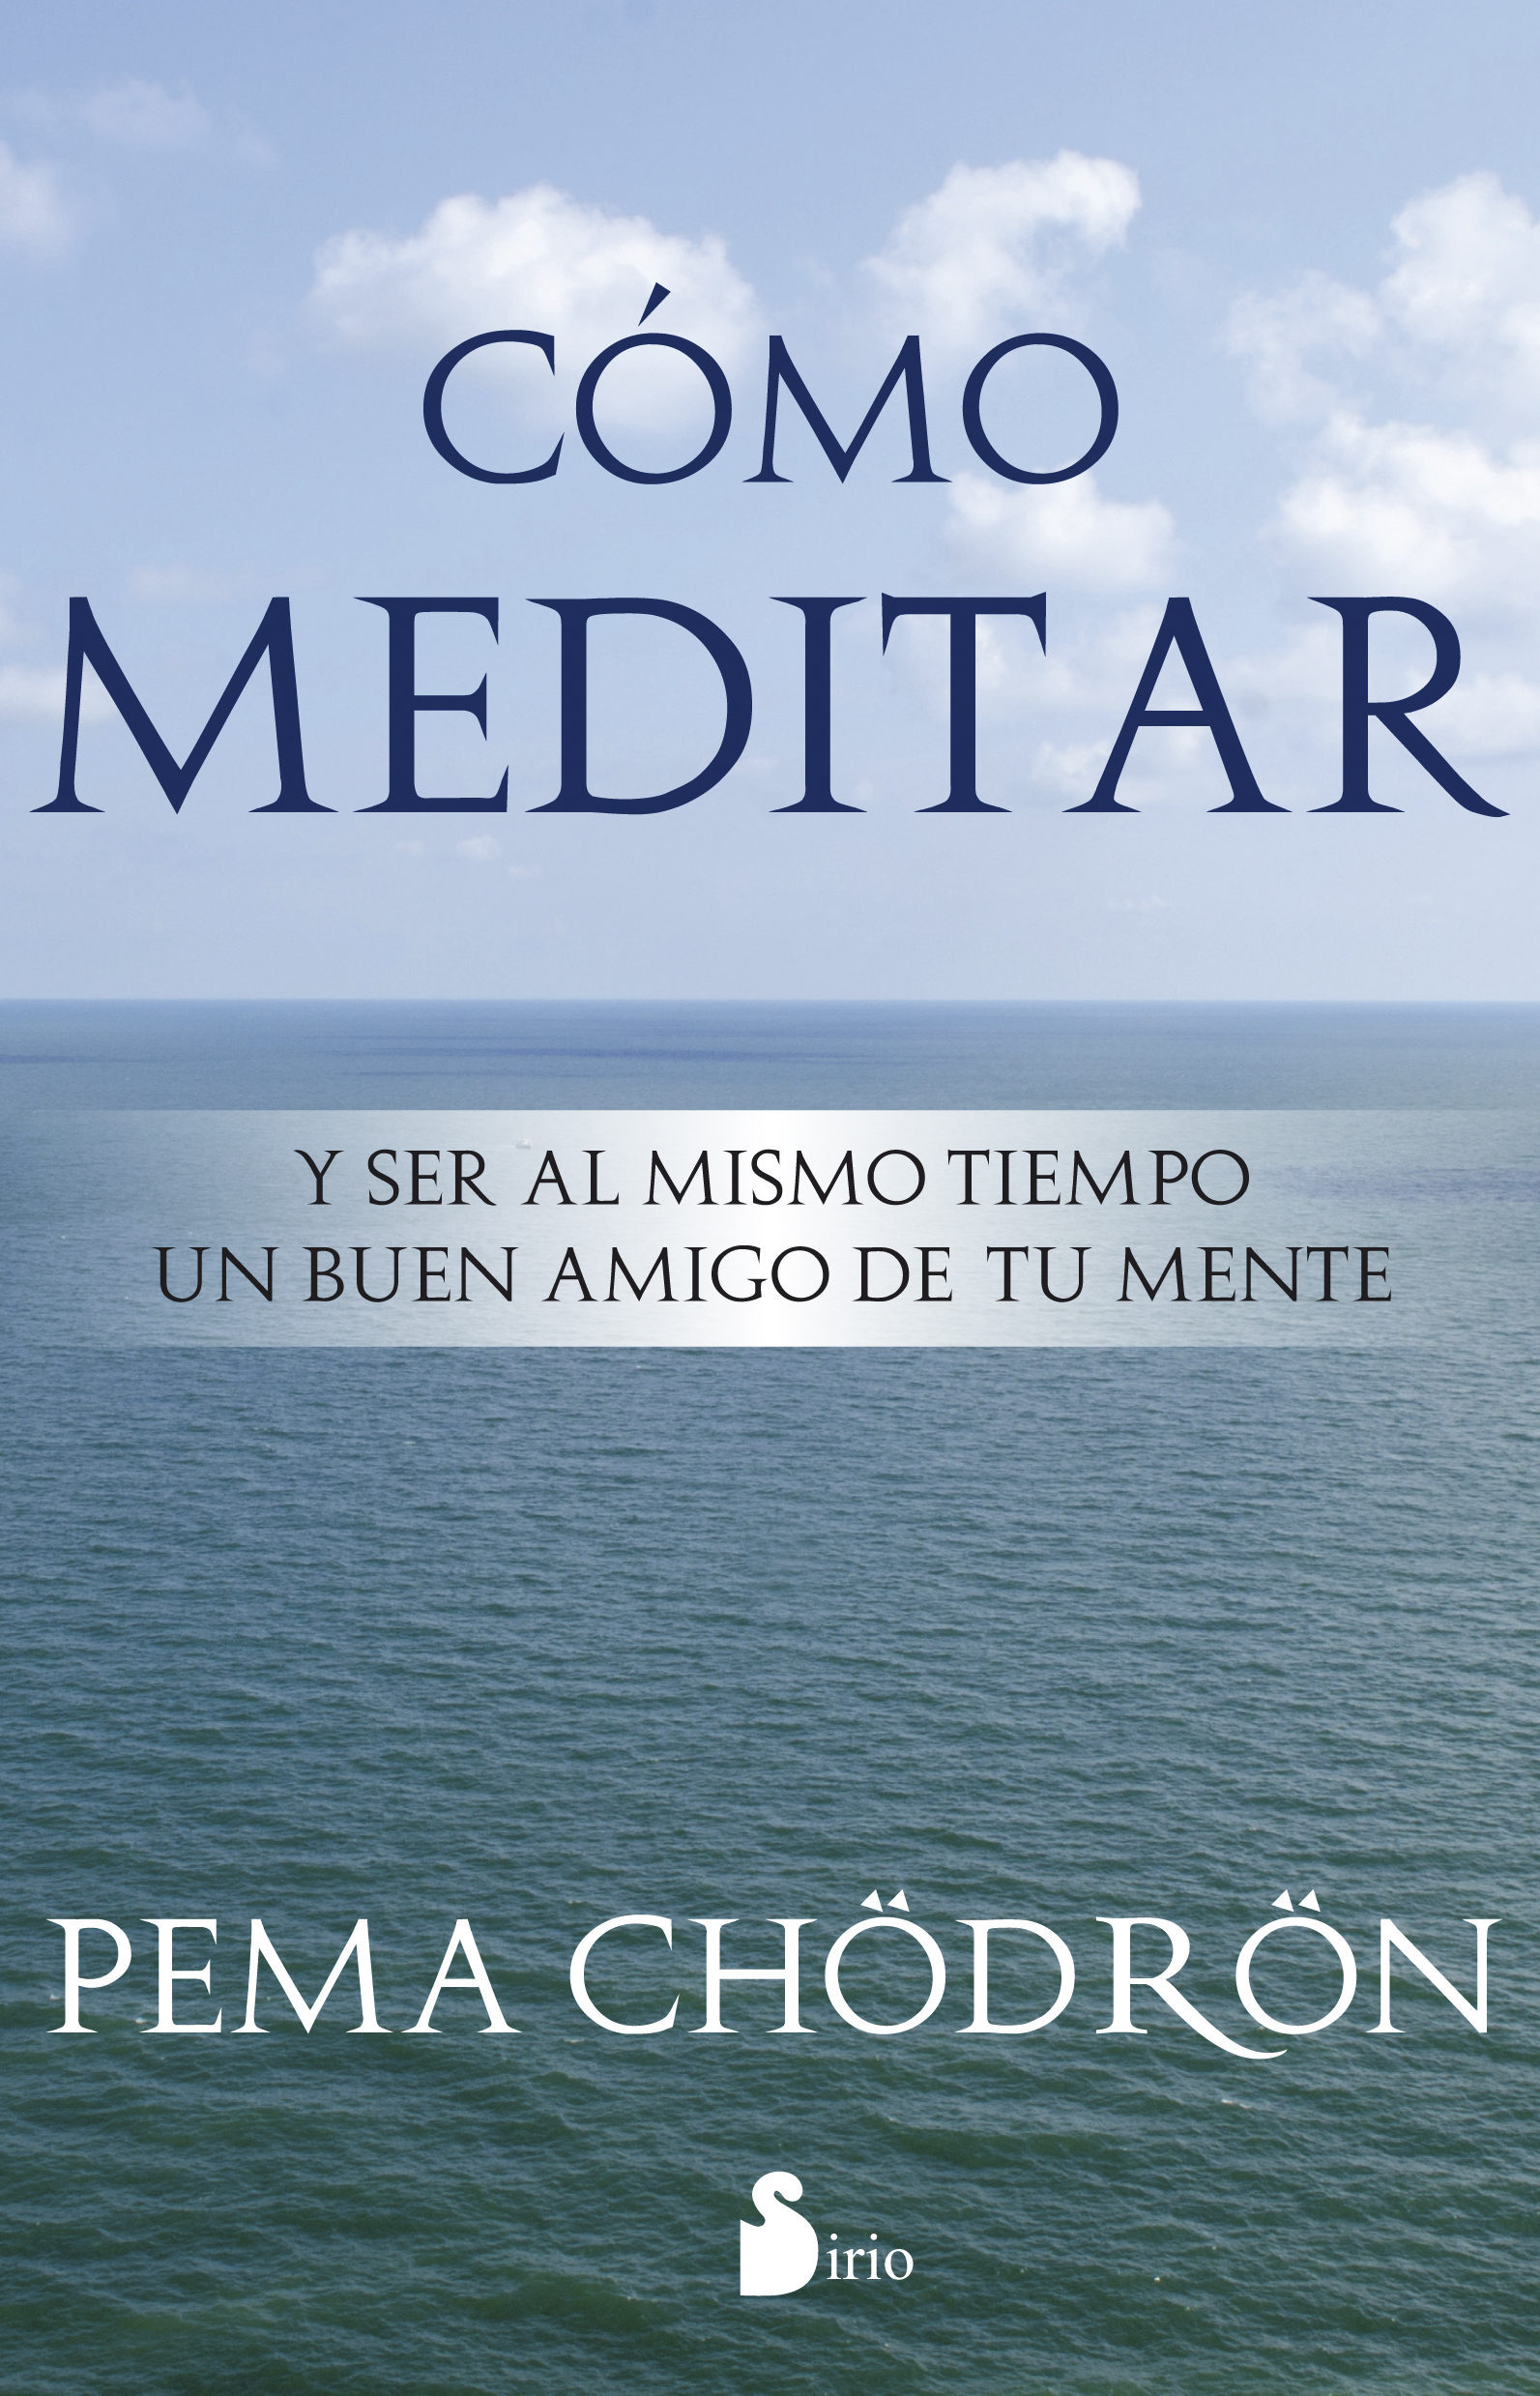 Como Meditar - Pema Chodron - Sirio